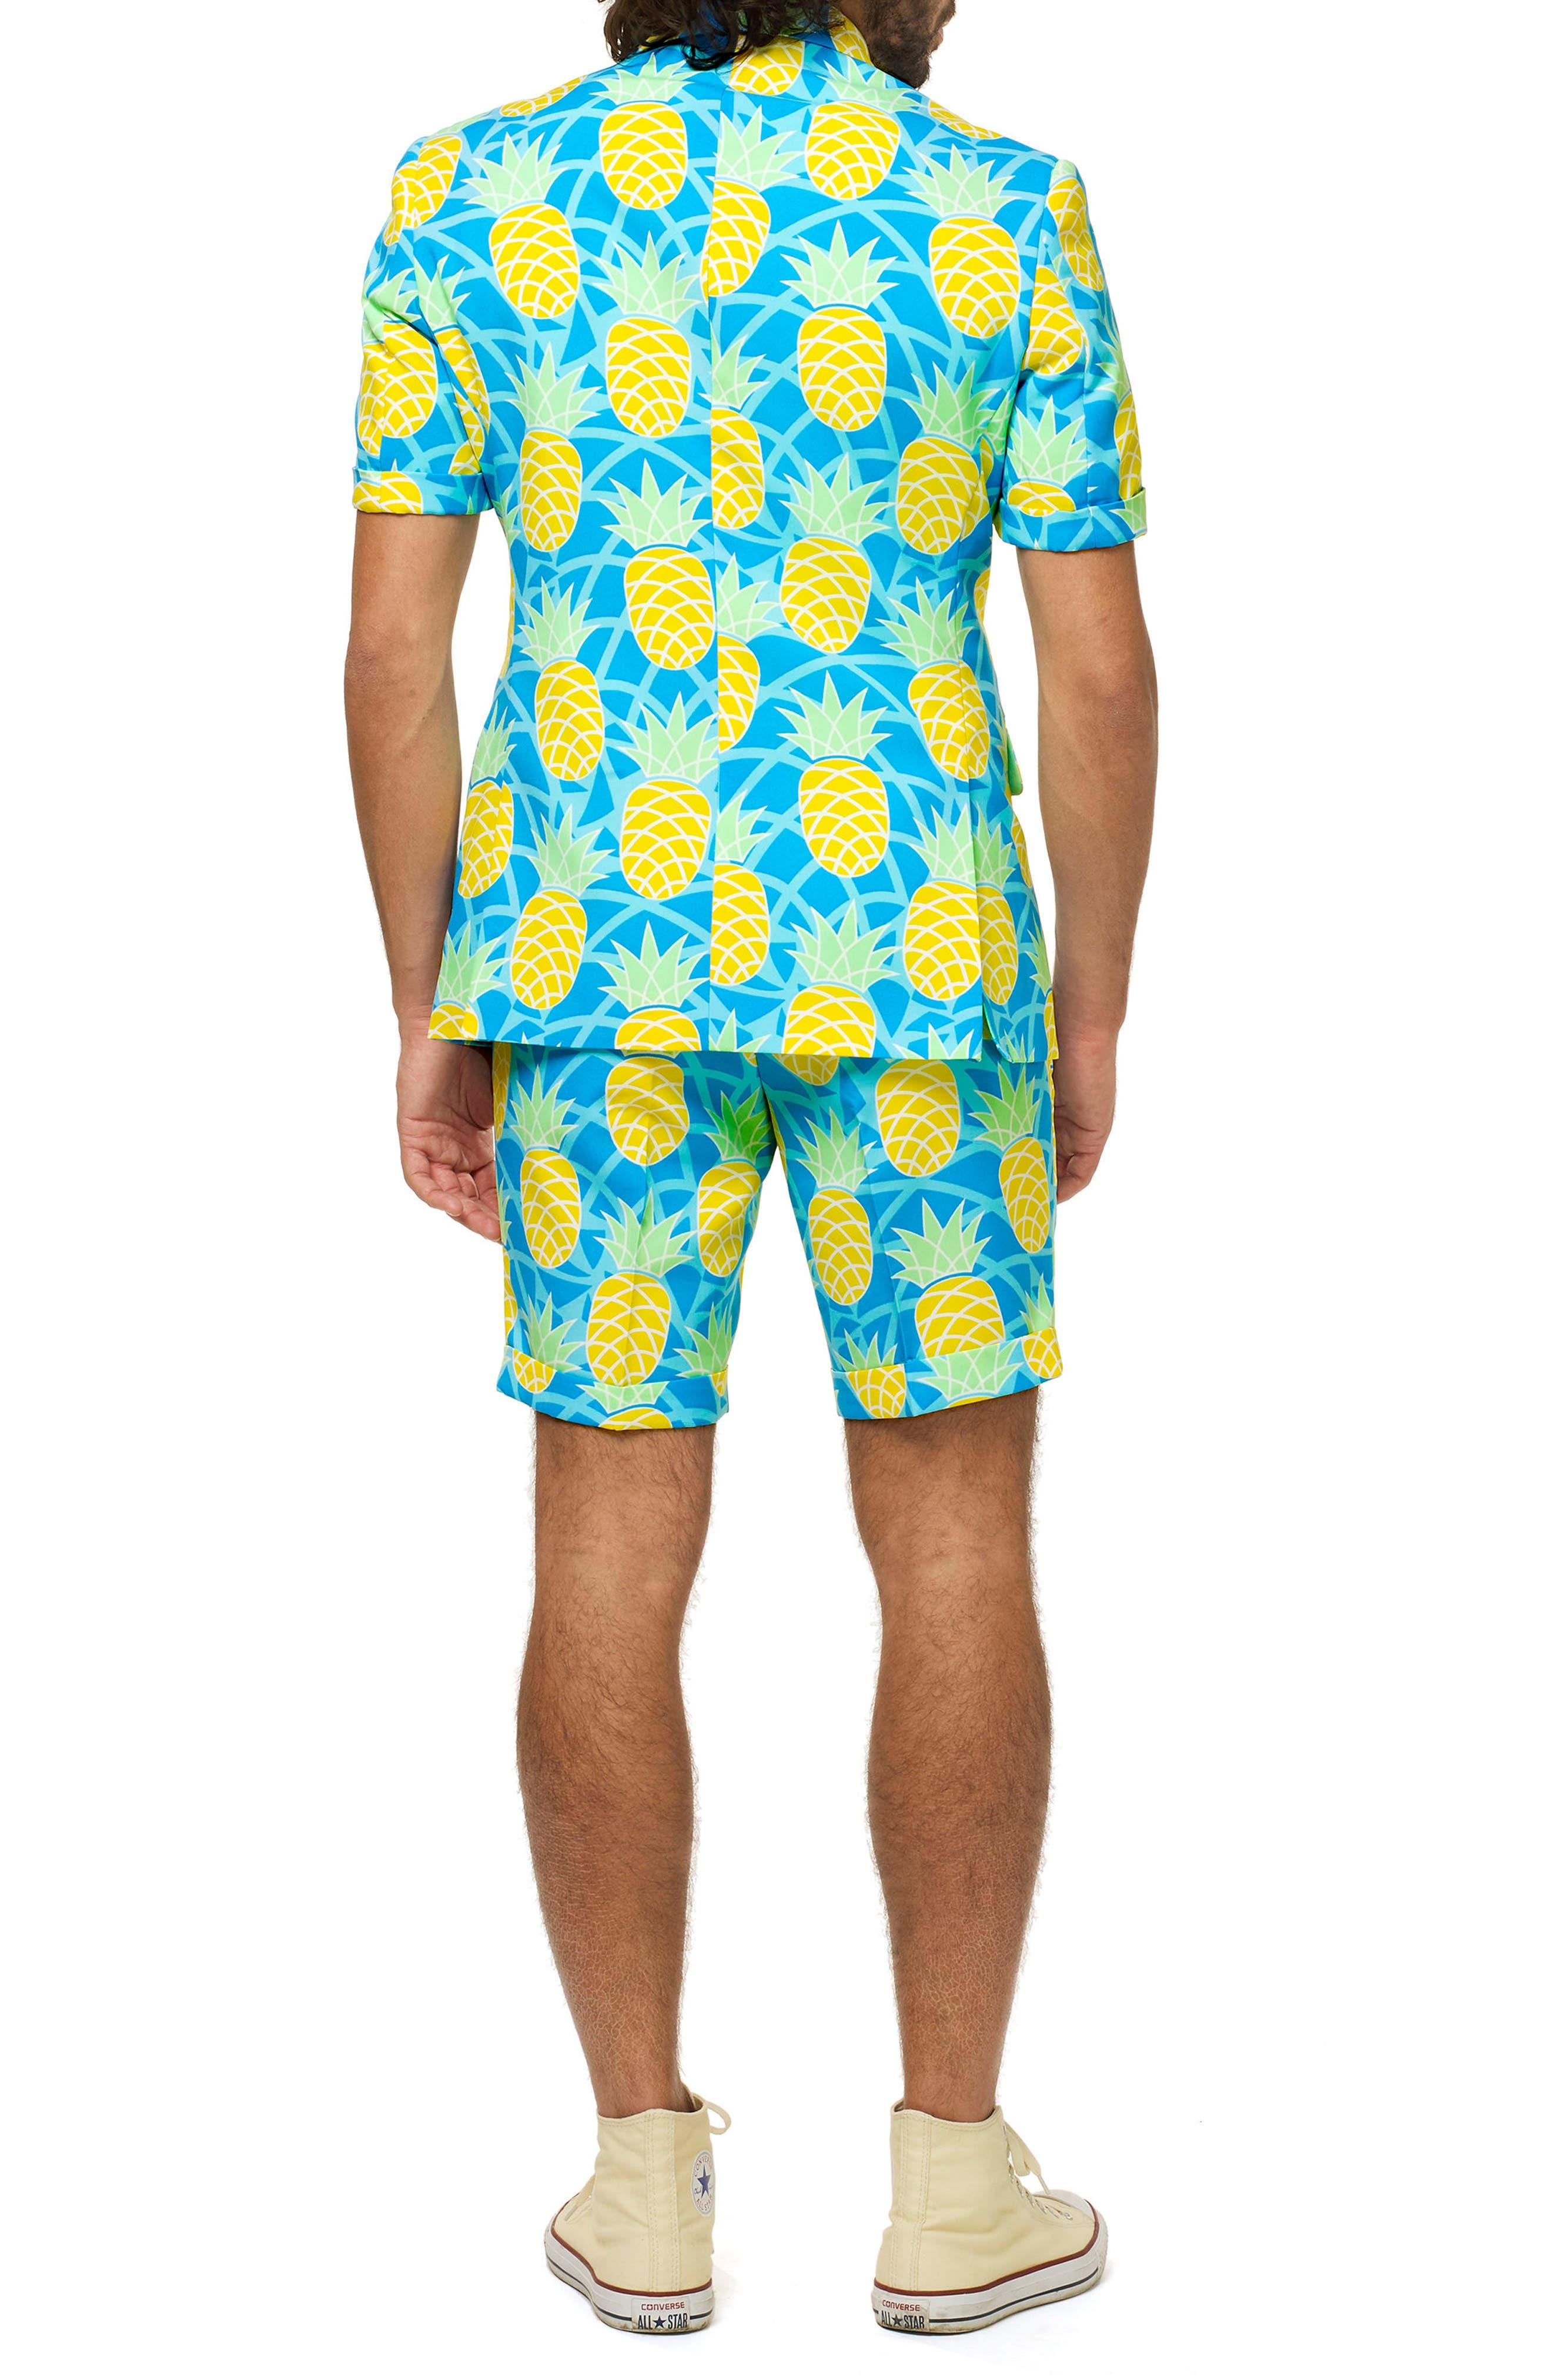 Shineapple Trim Fit Two-Piece Short Suit with Tie,                             Alternate thumbnail 2, color,                             400